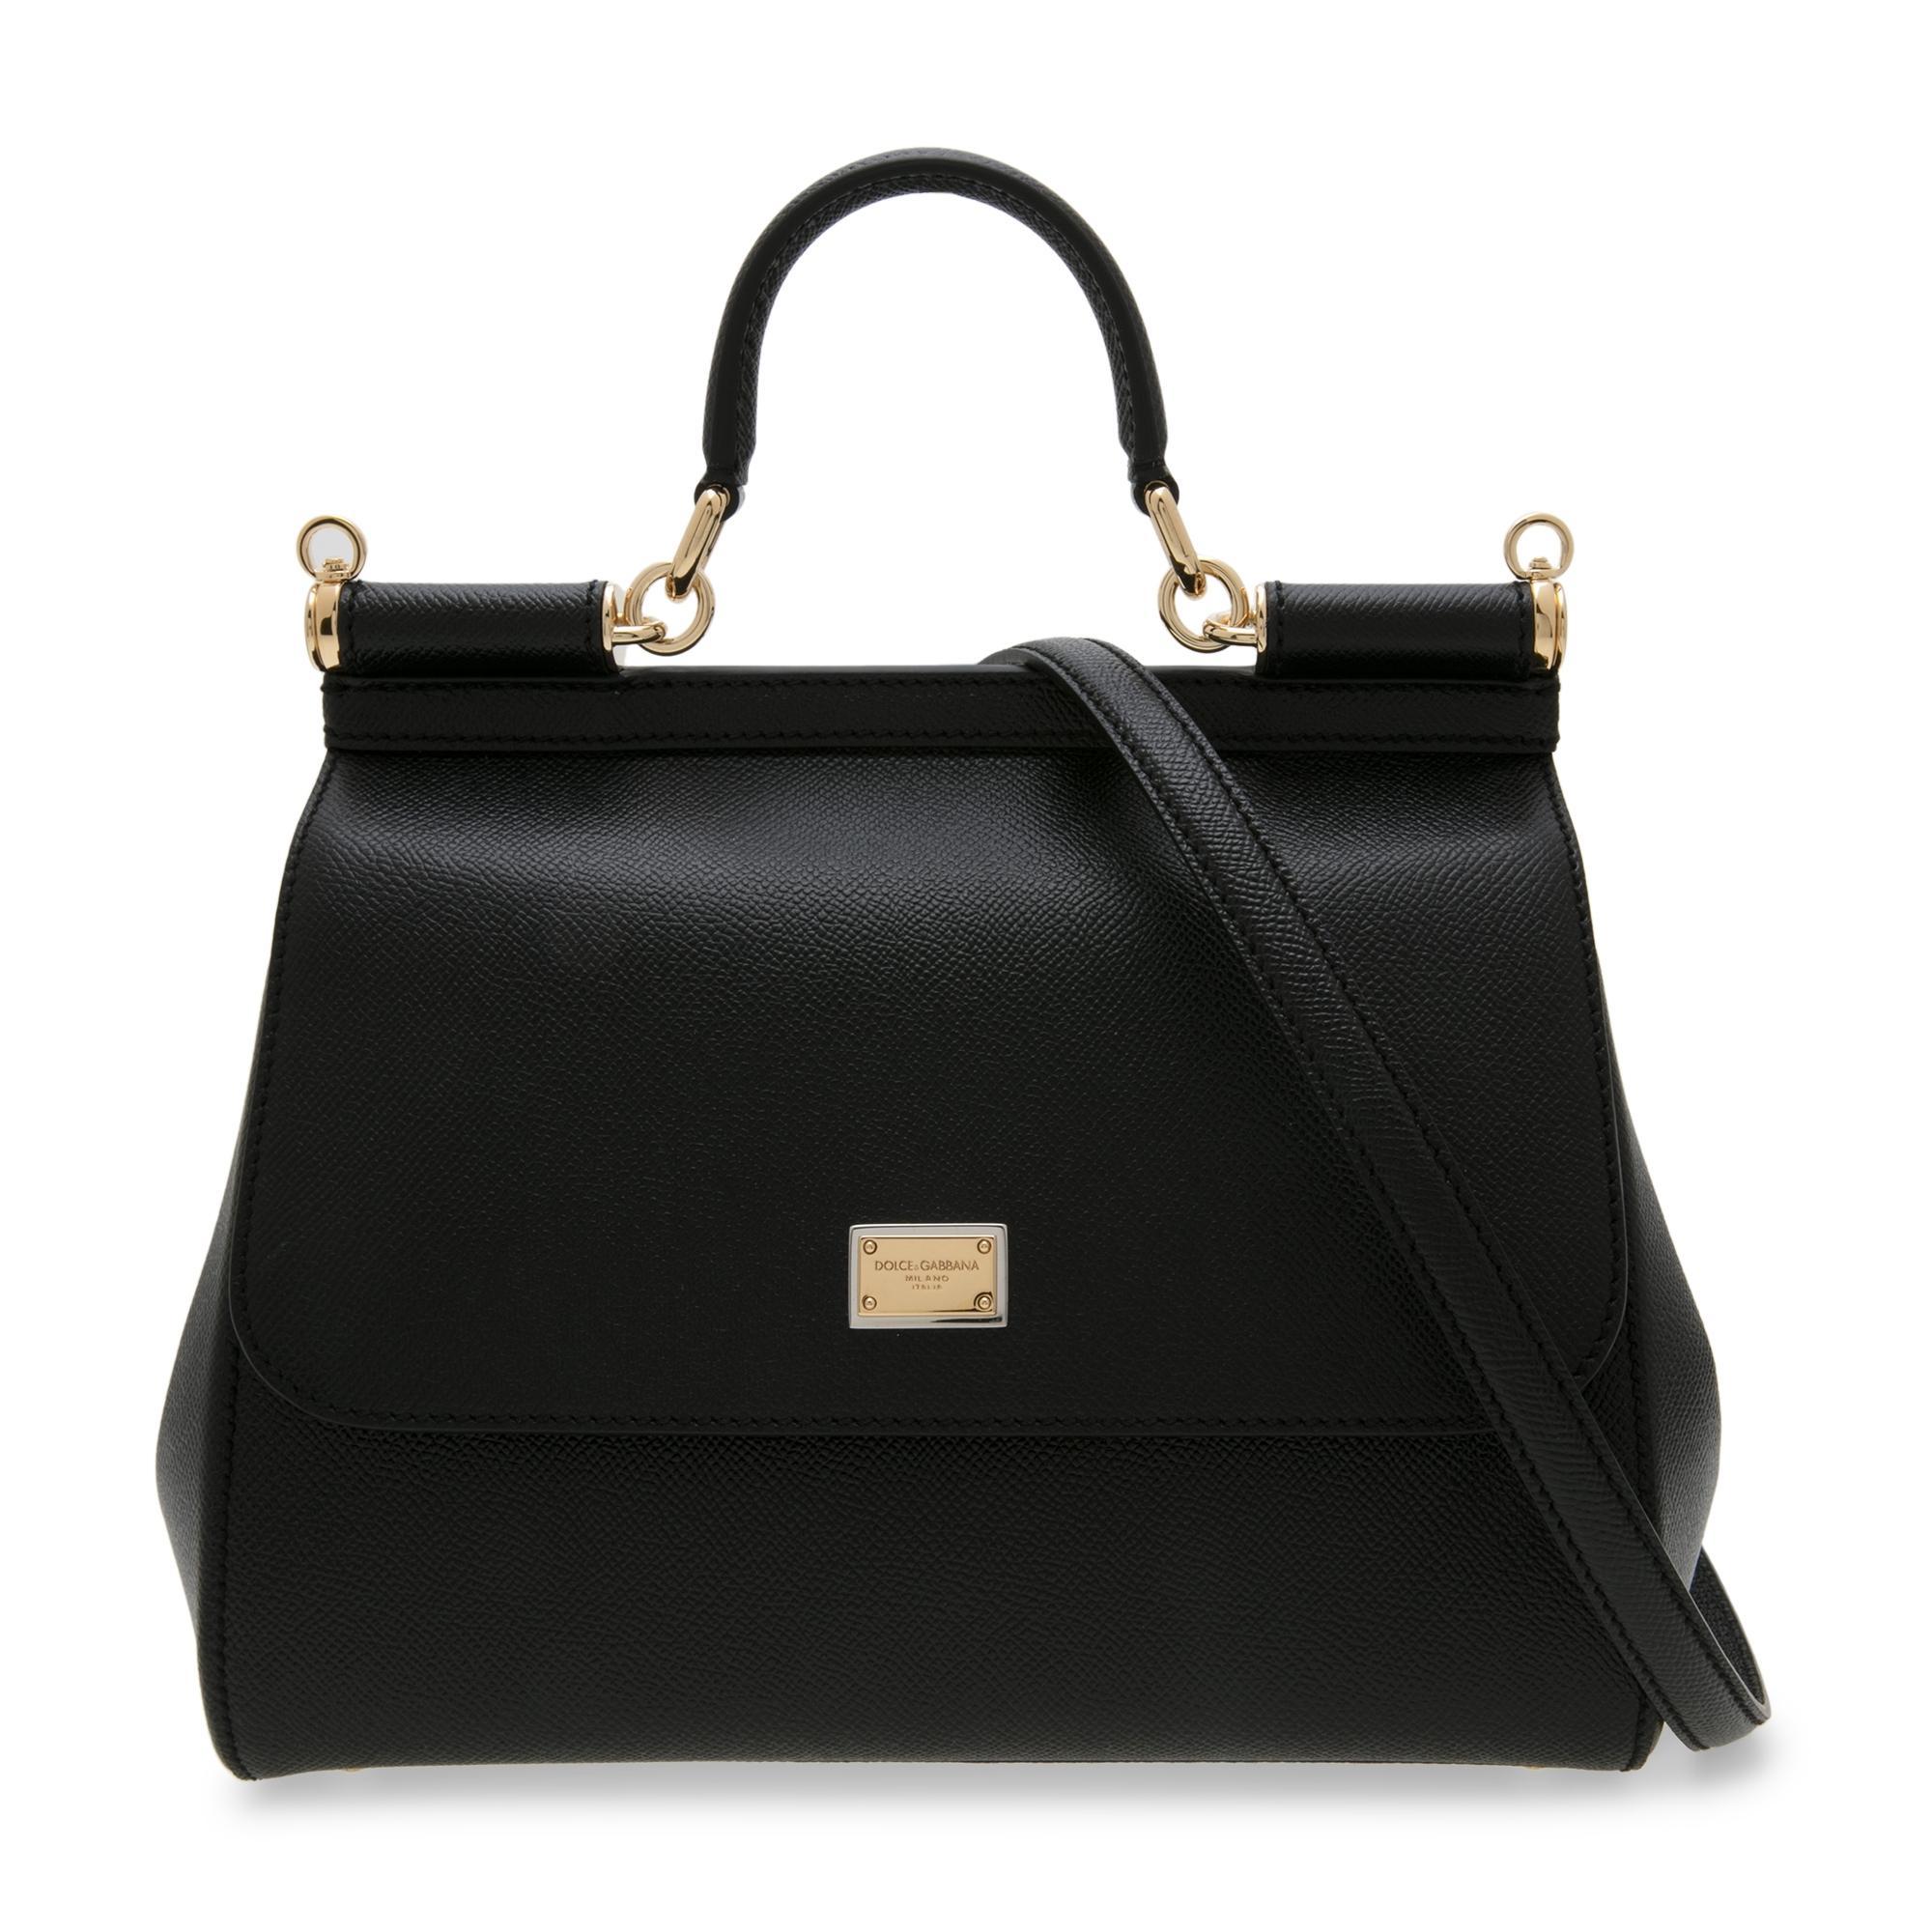 Sicily Dauphine medium handbag